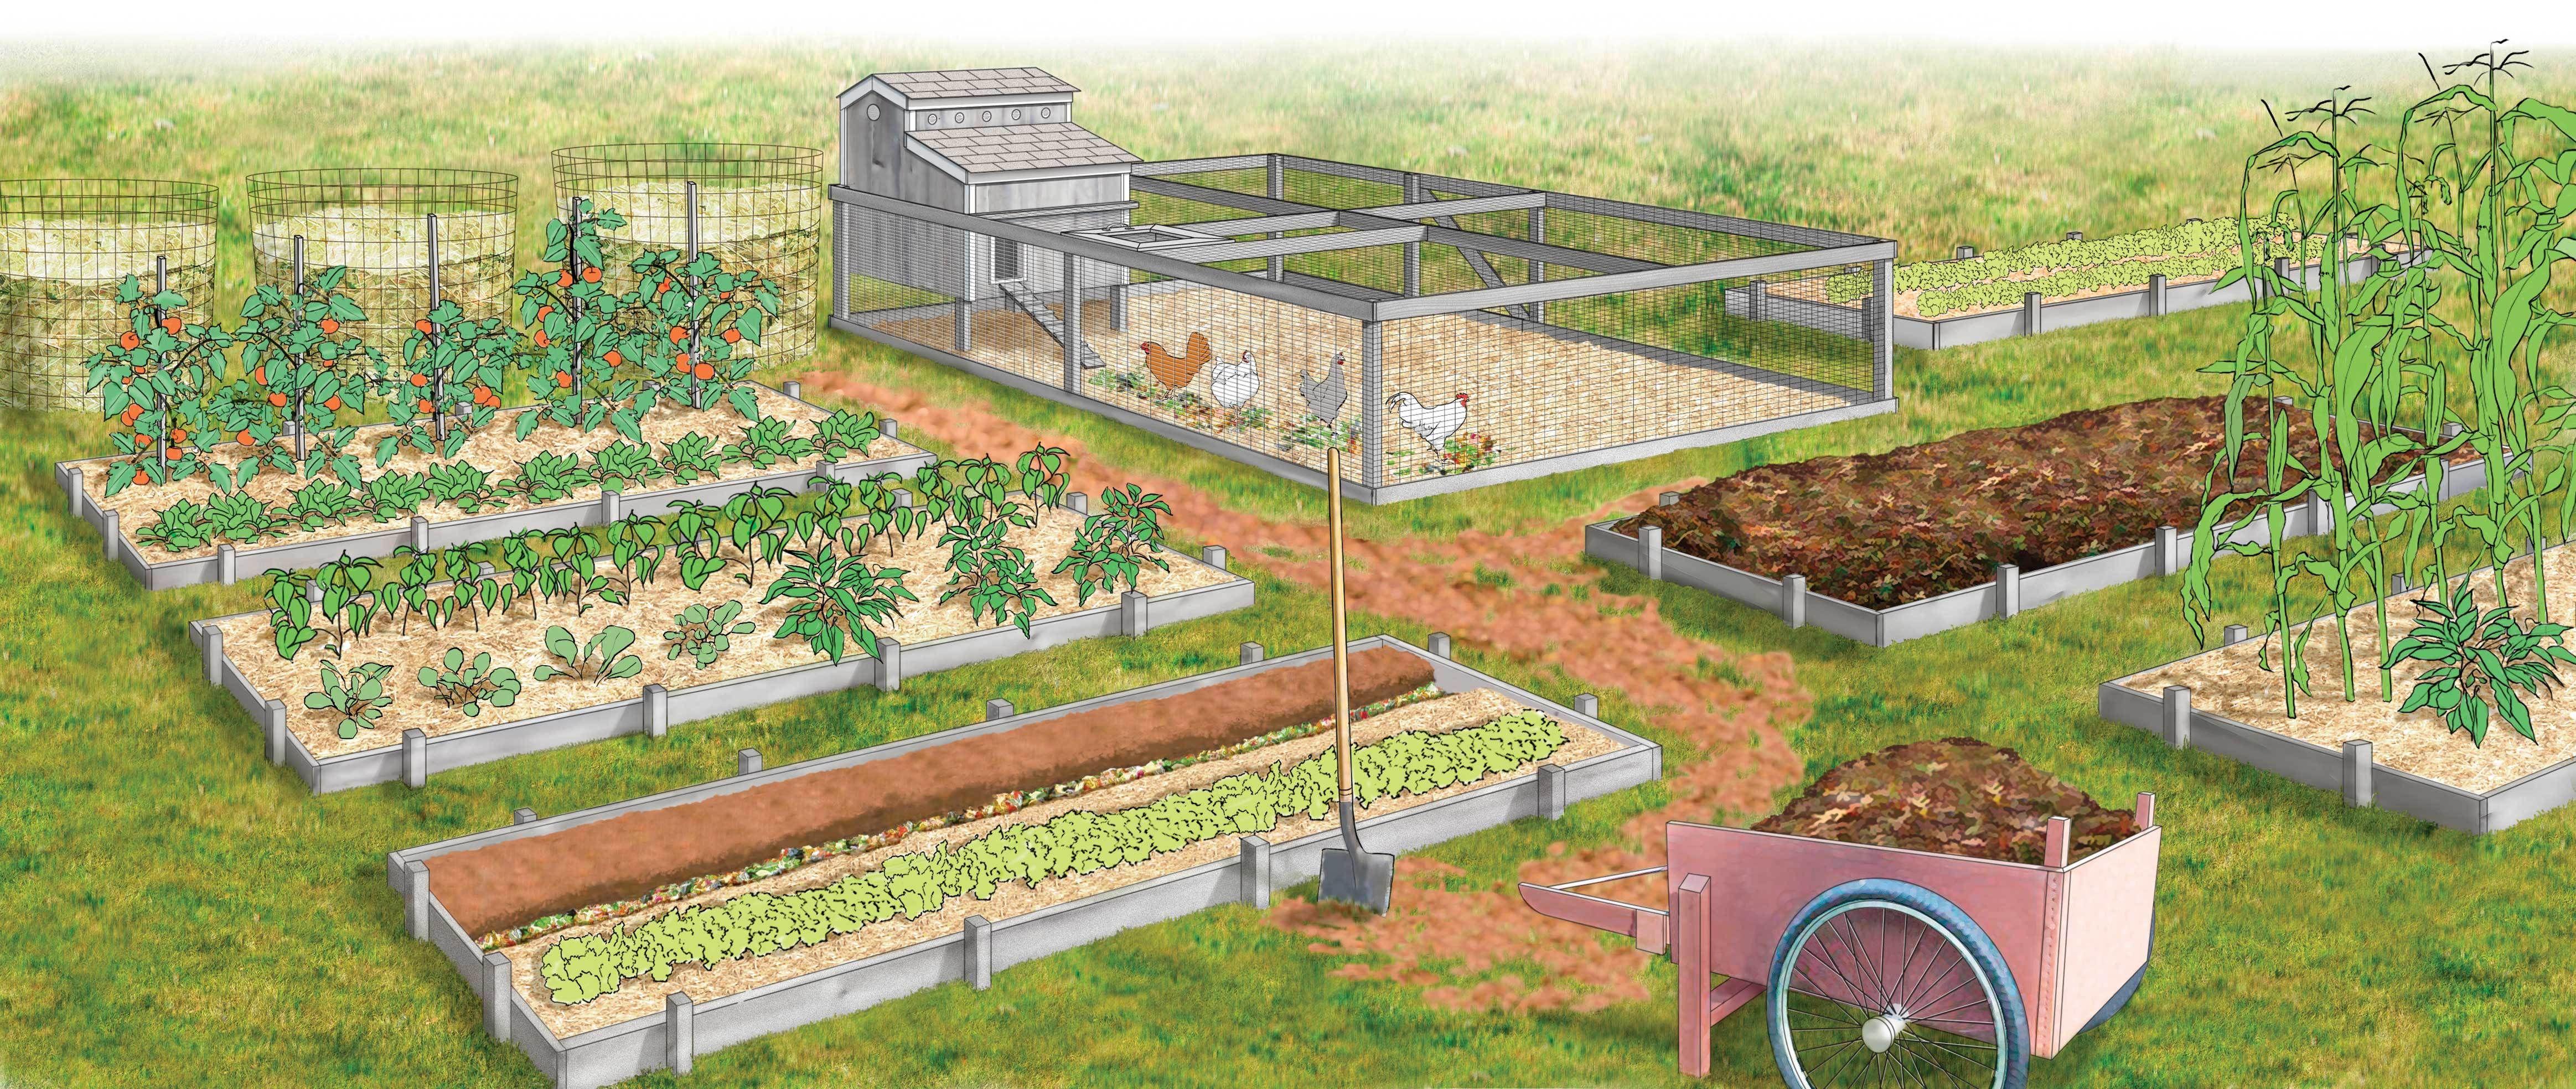 28 Farm Layout Design Ideas To Inspire Your Homestead Dream Farm